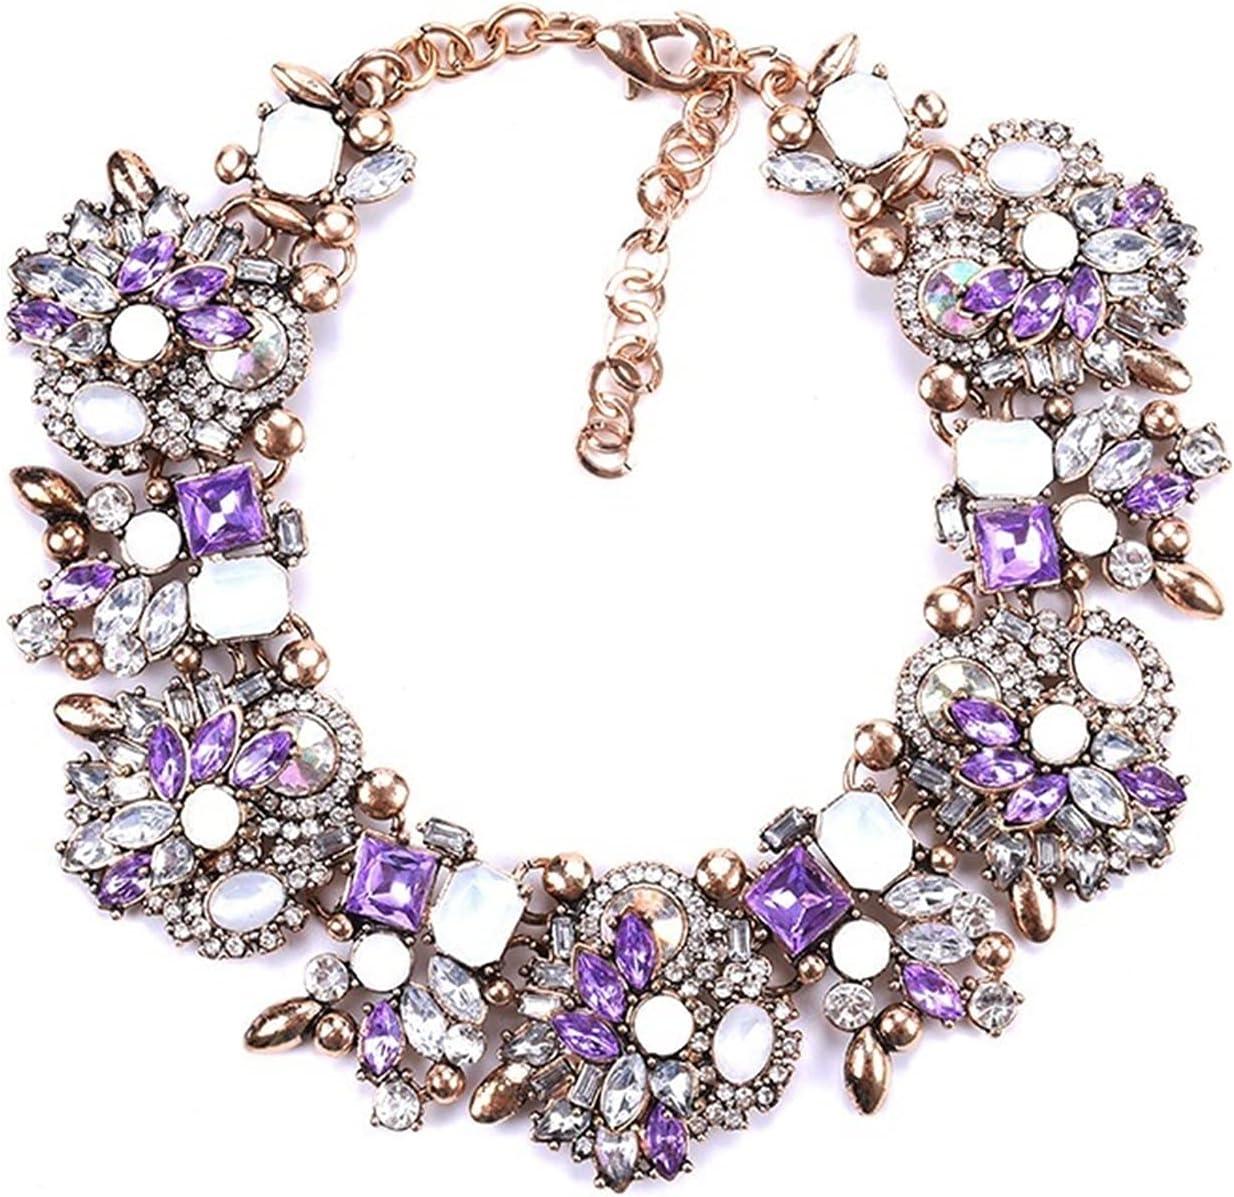 ZCPCS New 2021 Indian Statement Choker Necklace Women Luxury Crystal Rhinestone Big Bib Necklace Femme Boho Ethnic Large Collar Necklace (Metal Color : Purple)